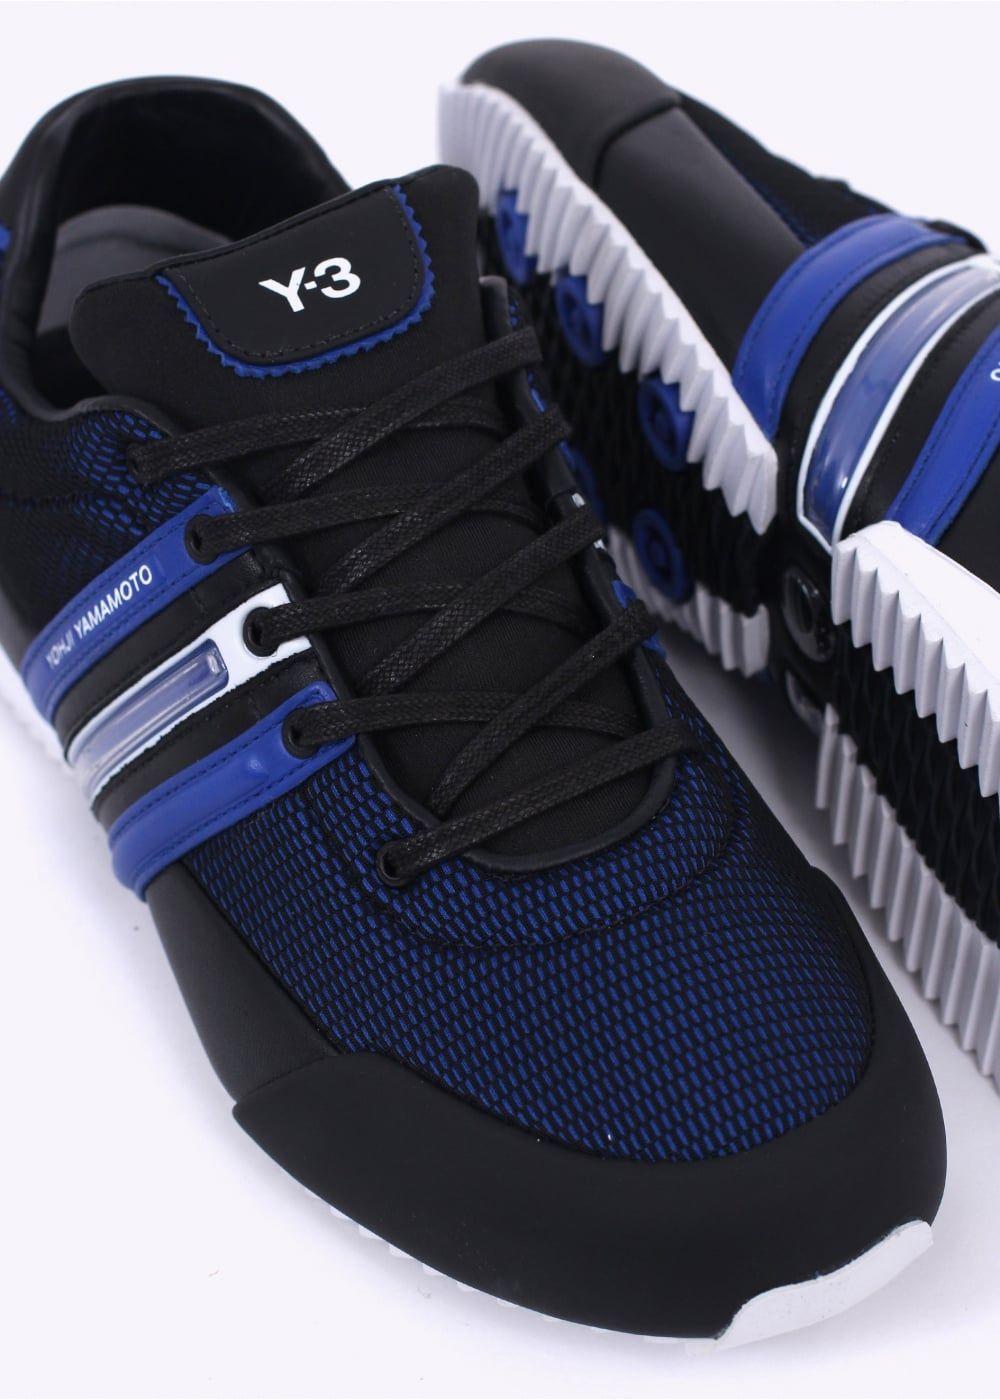 f7ecc96aec93dc Y3   Adidas - Yohji Yamamoto Sprint Trainers - Blue   Black